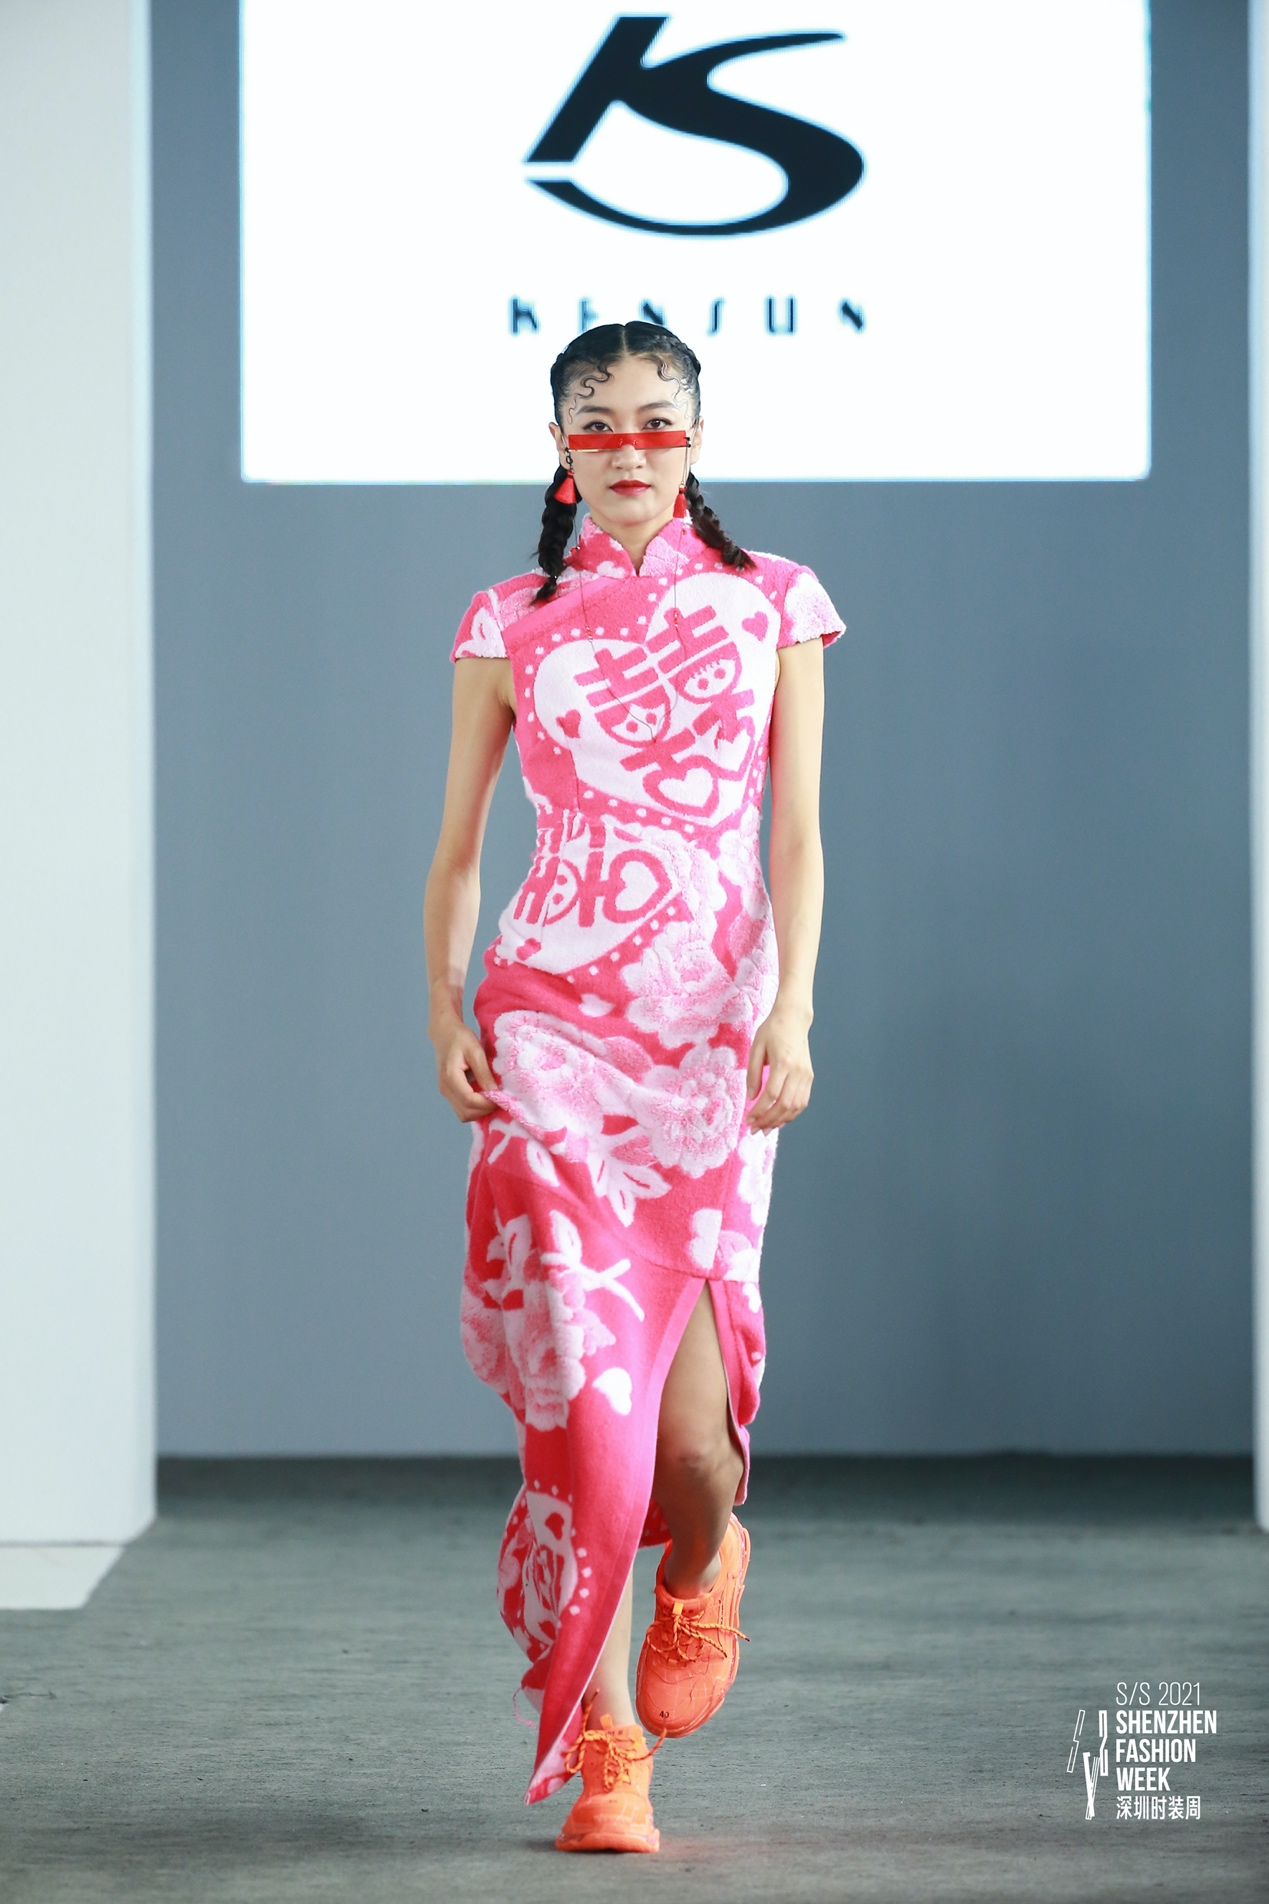 "KENSUN肯逊:""与玲同袍"",用一场旗袍秀展现中国风"